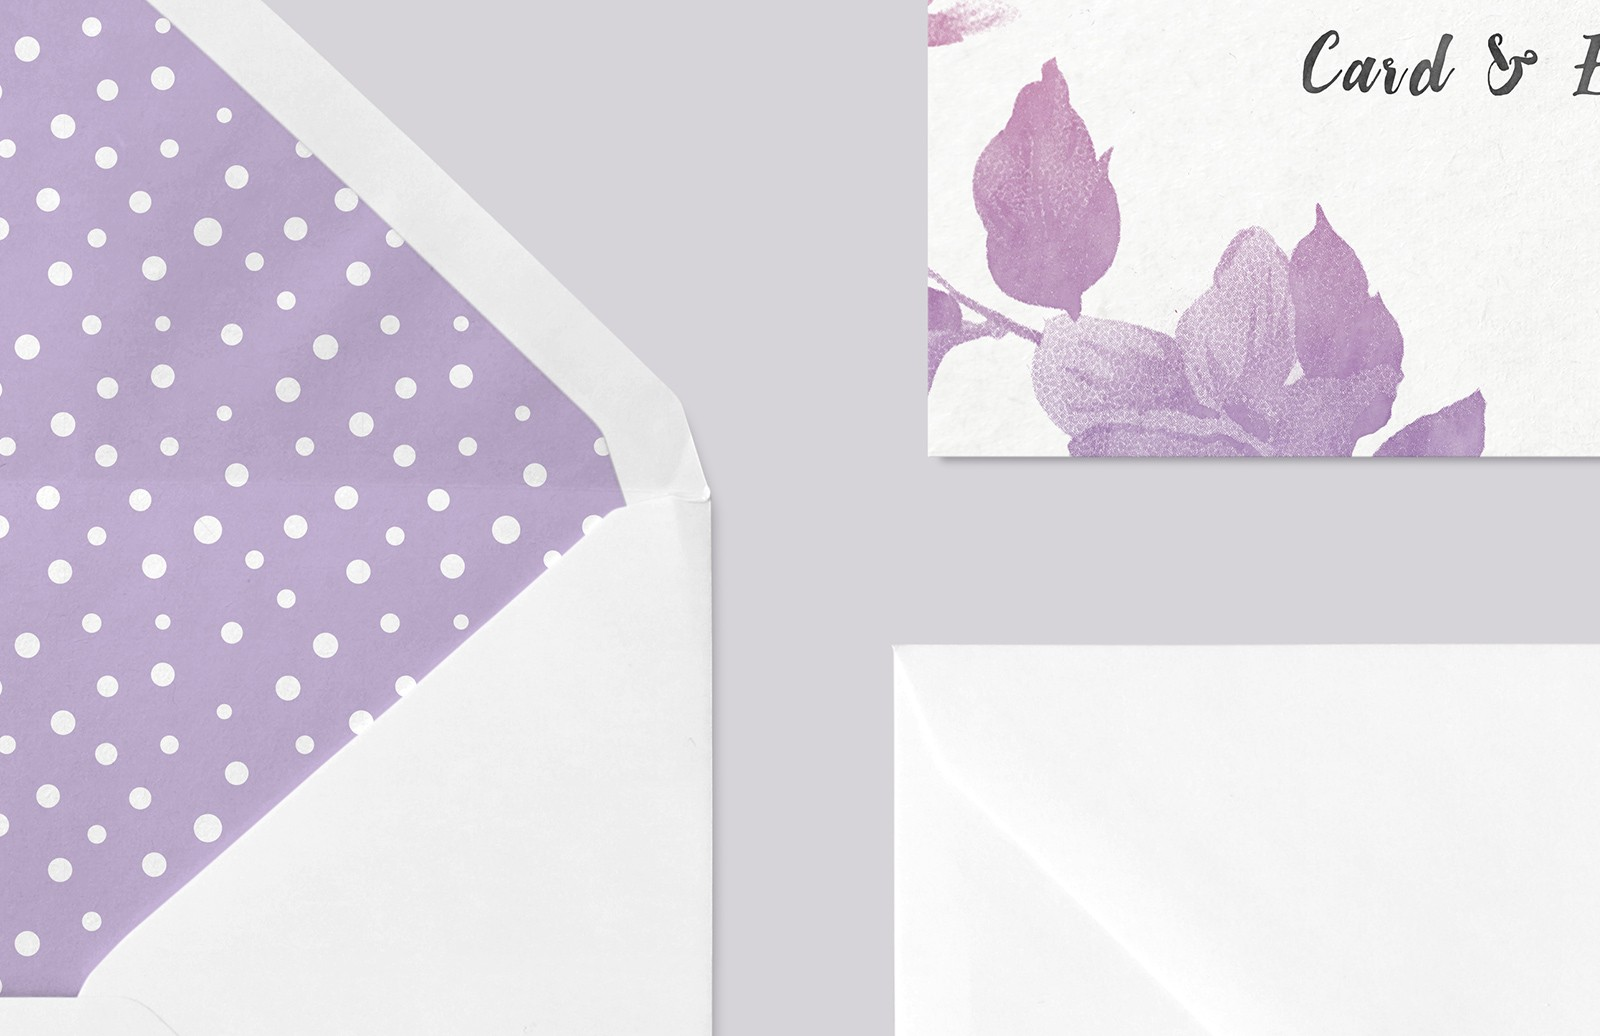 Large Invitation  Card   Envelope  Mockup  Preview 3